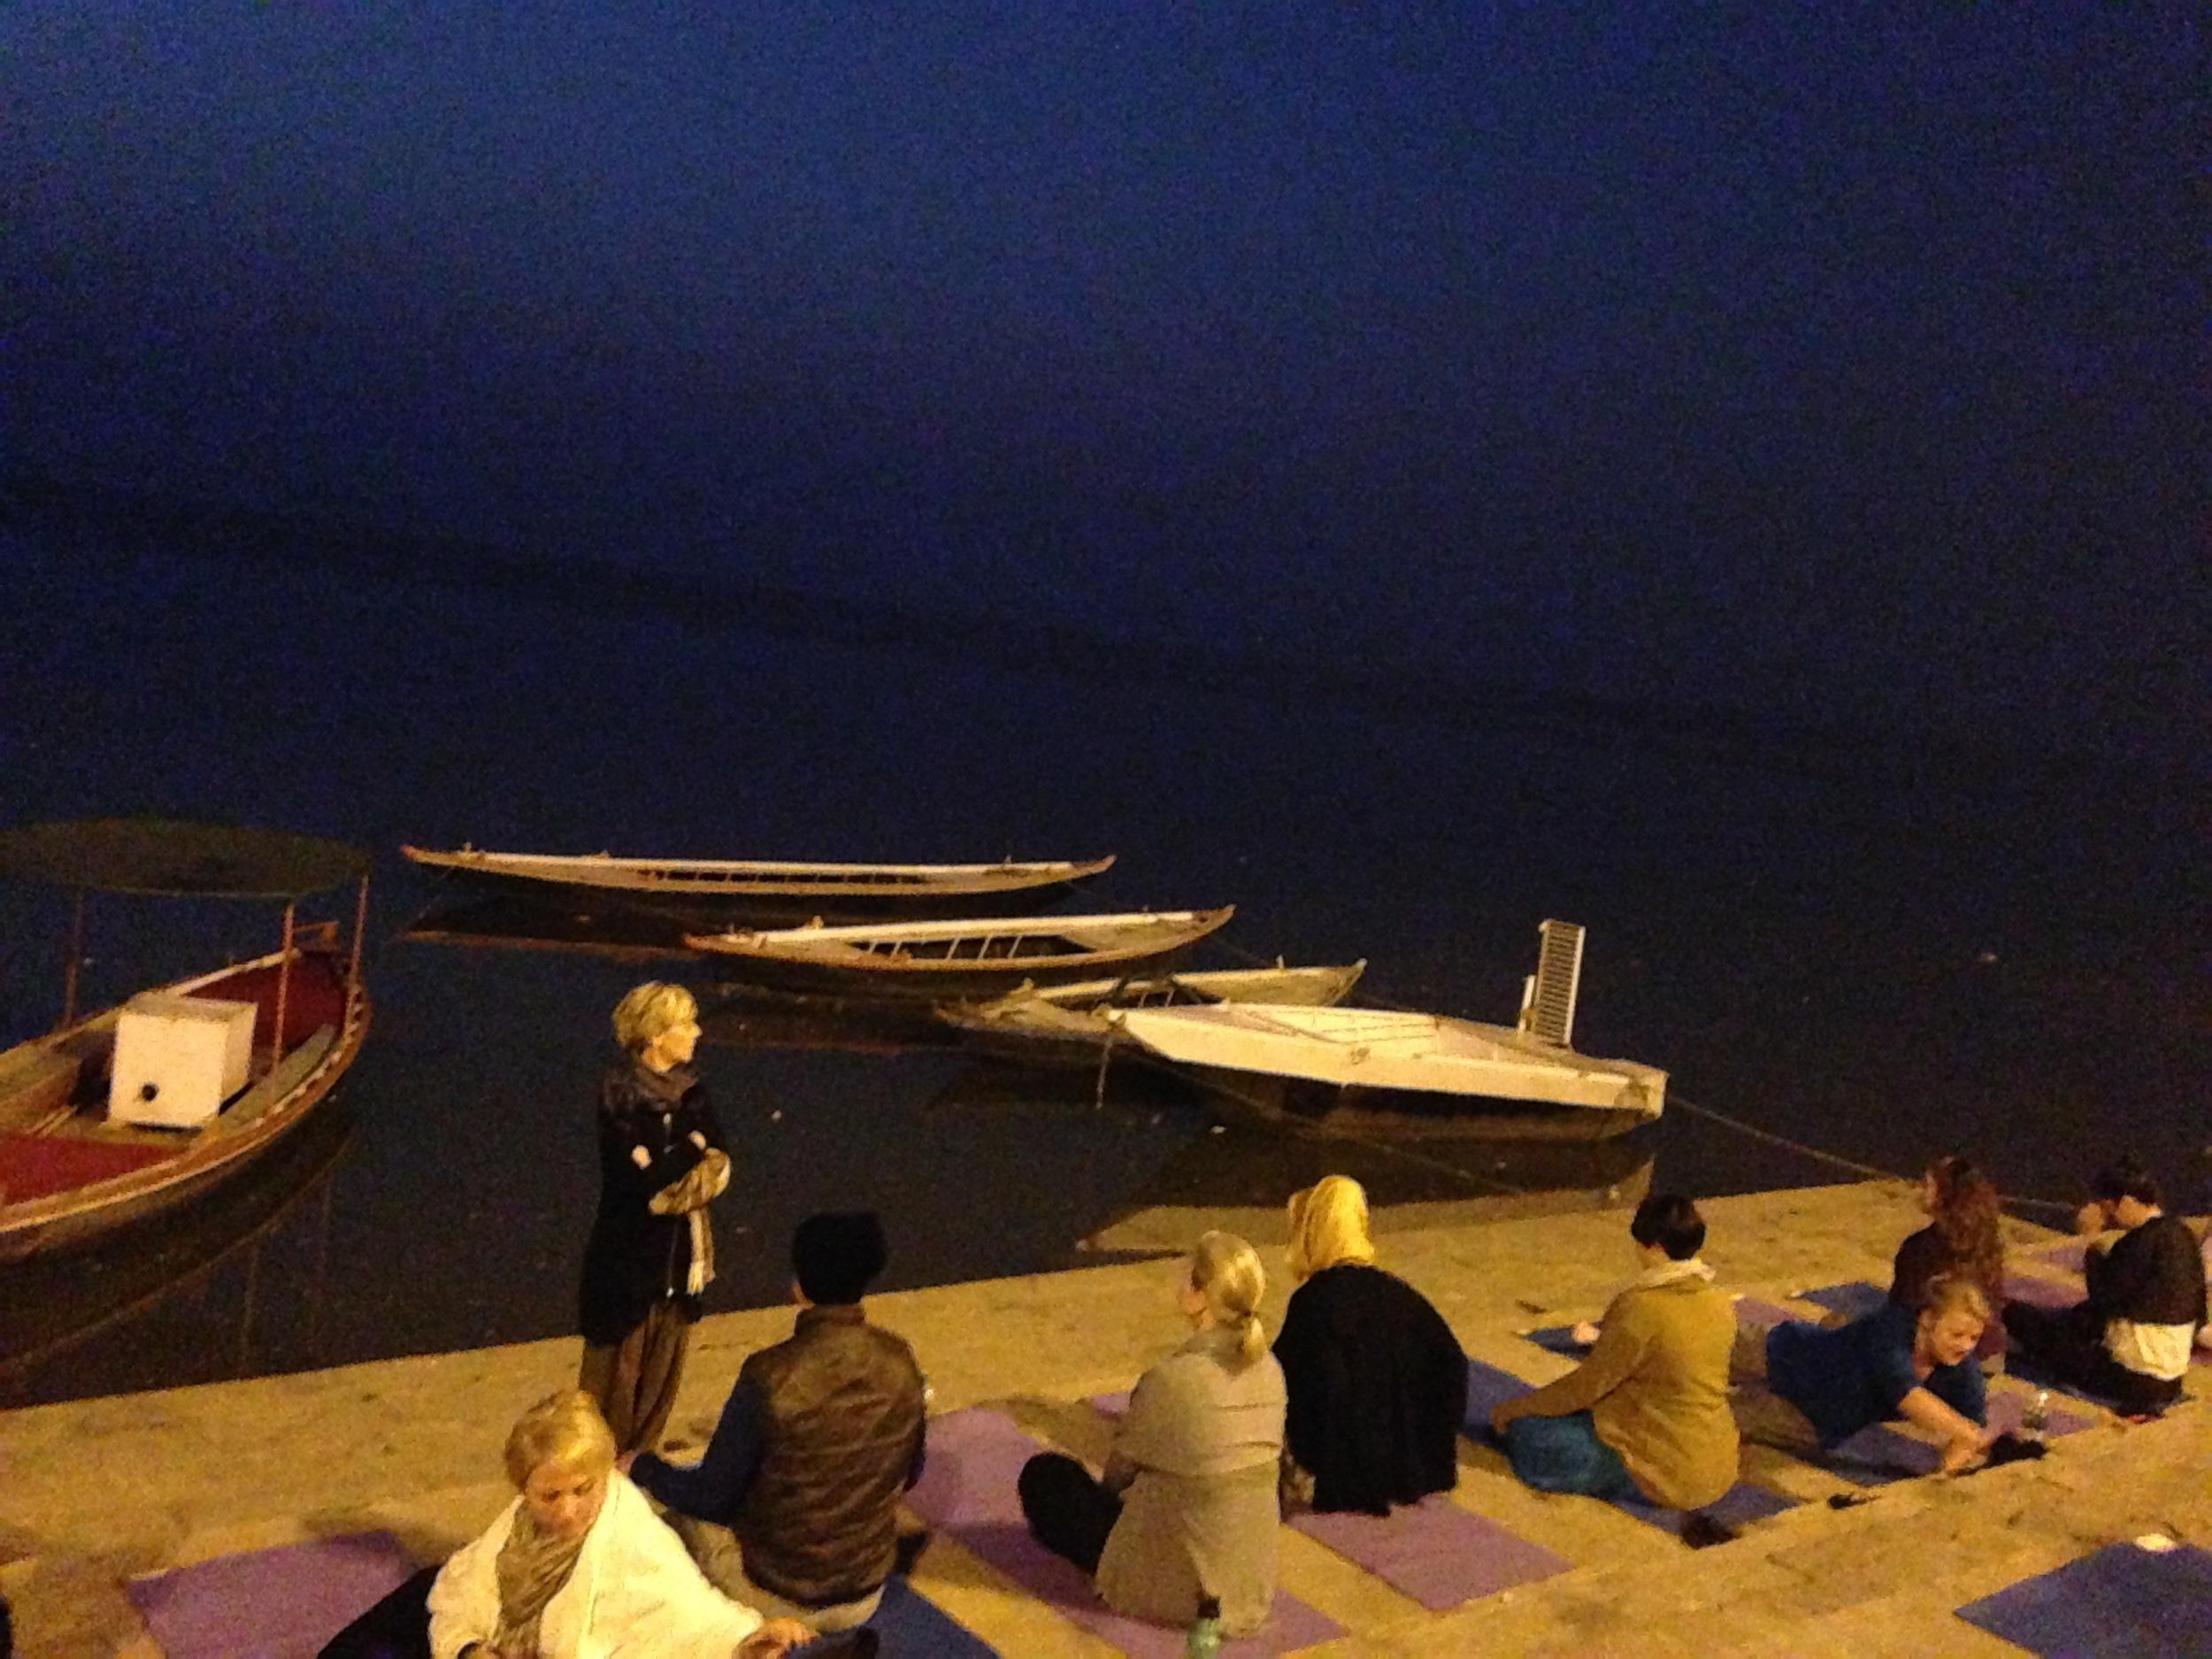 Yoga on the Ganges. Photo Credit: Dandapani